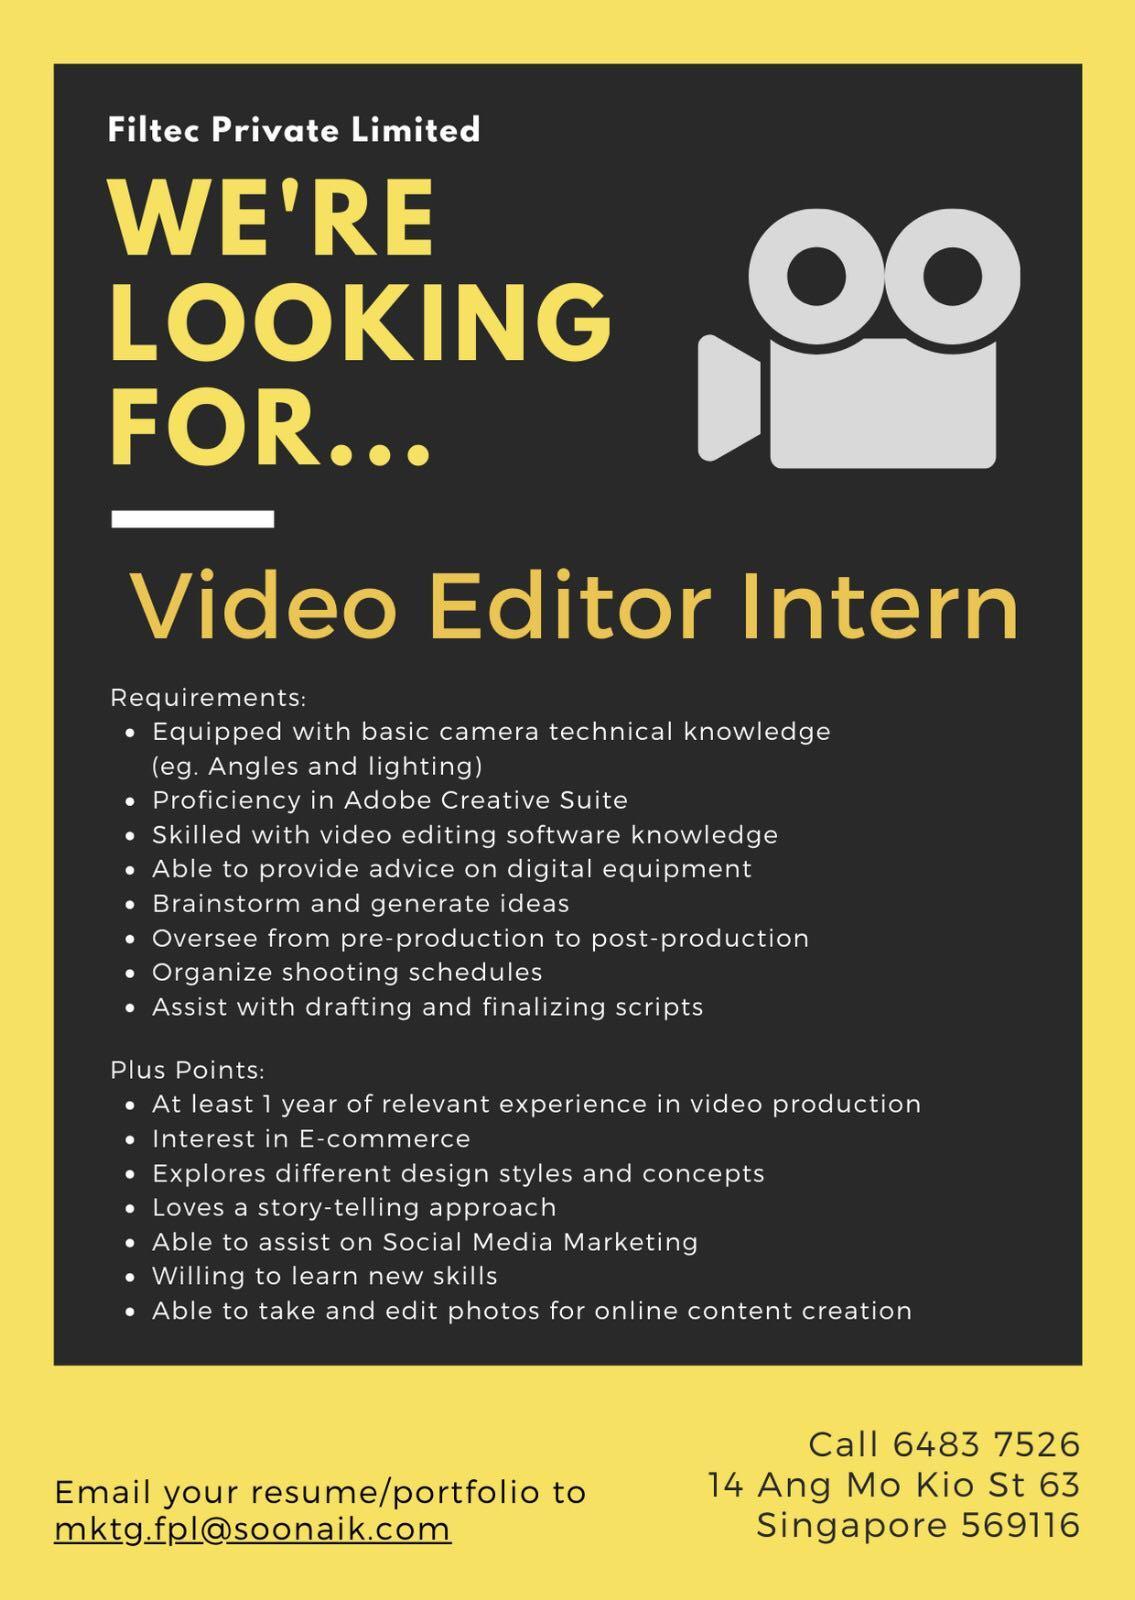 Video Editor Intern